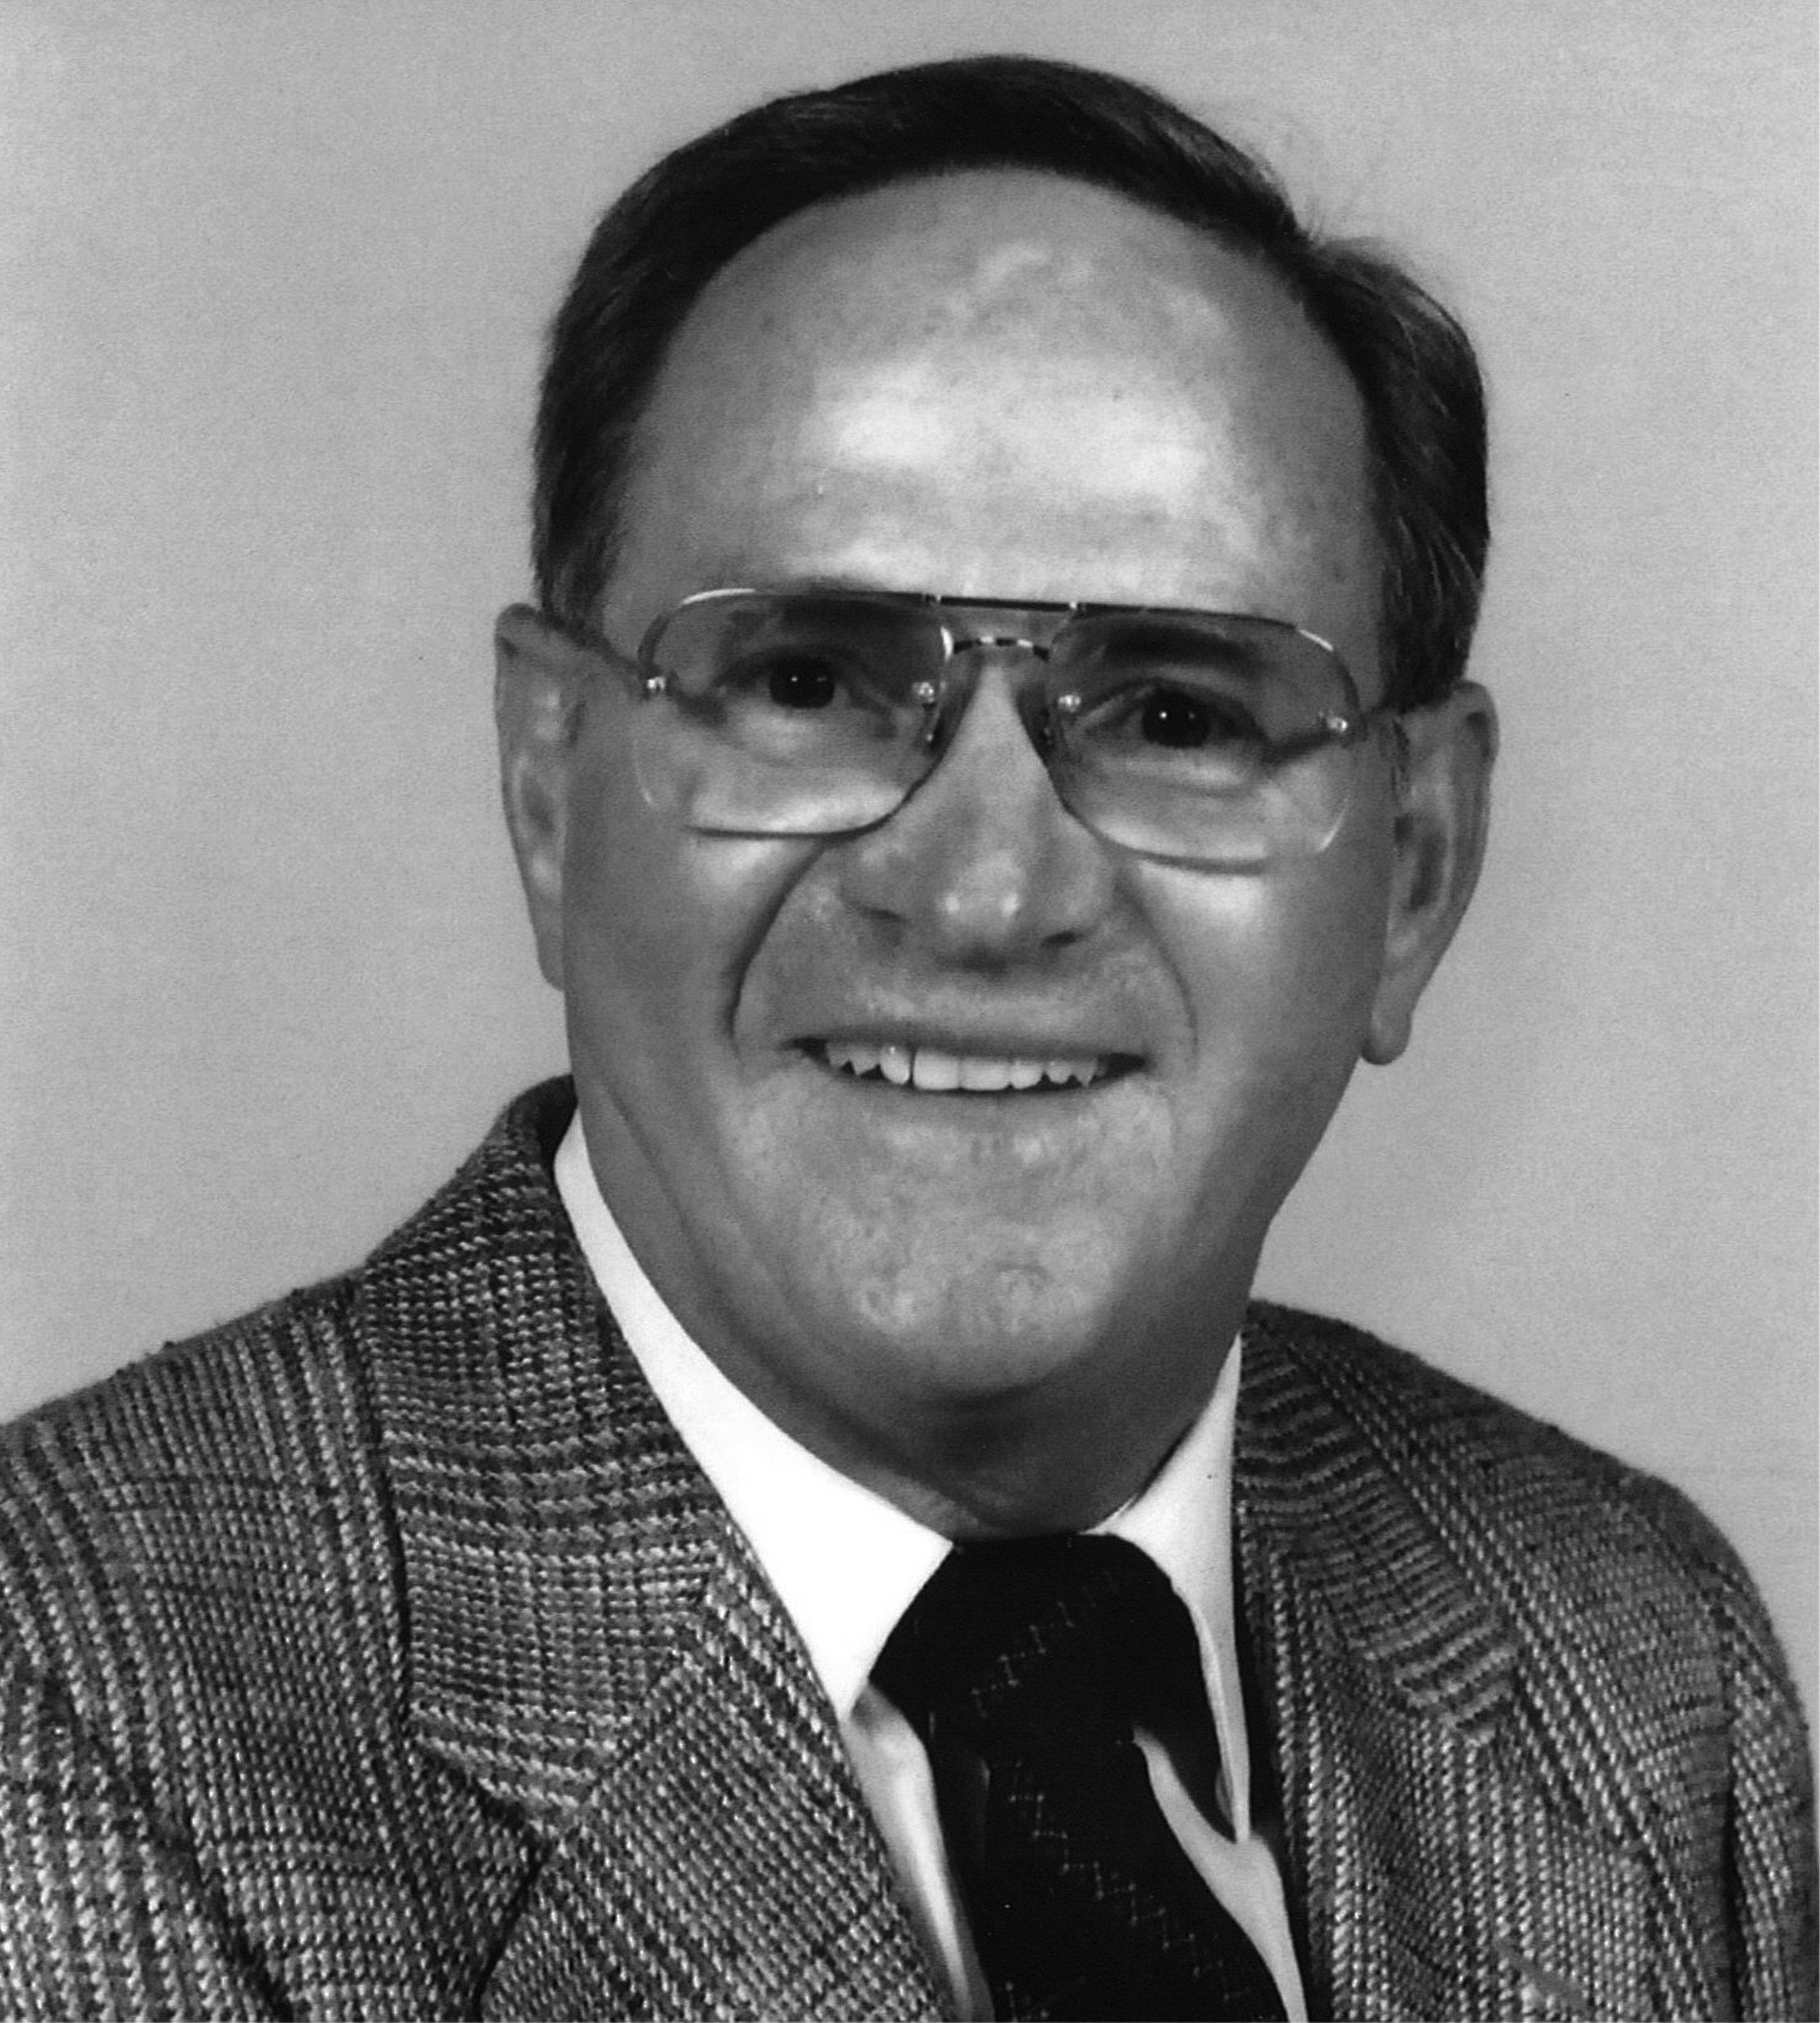 Wogan S. Badcock, Jr.